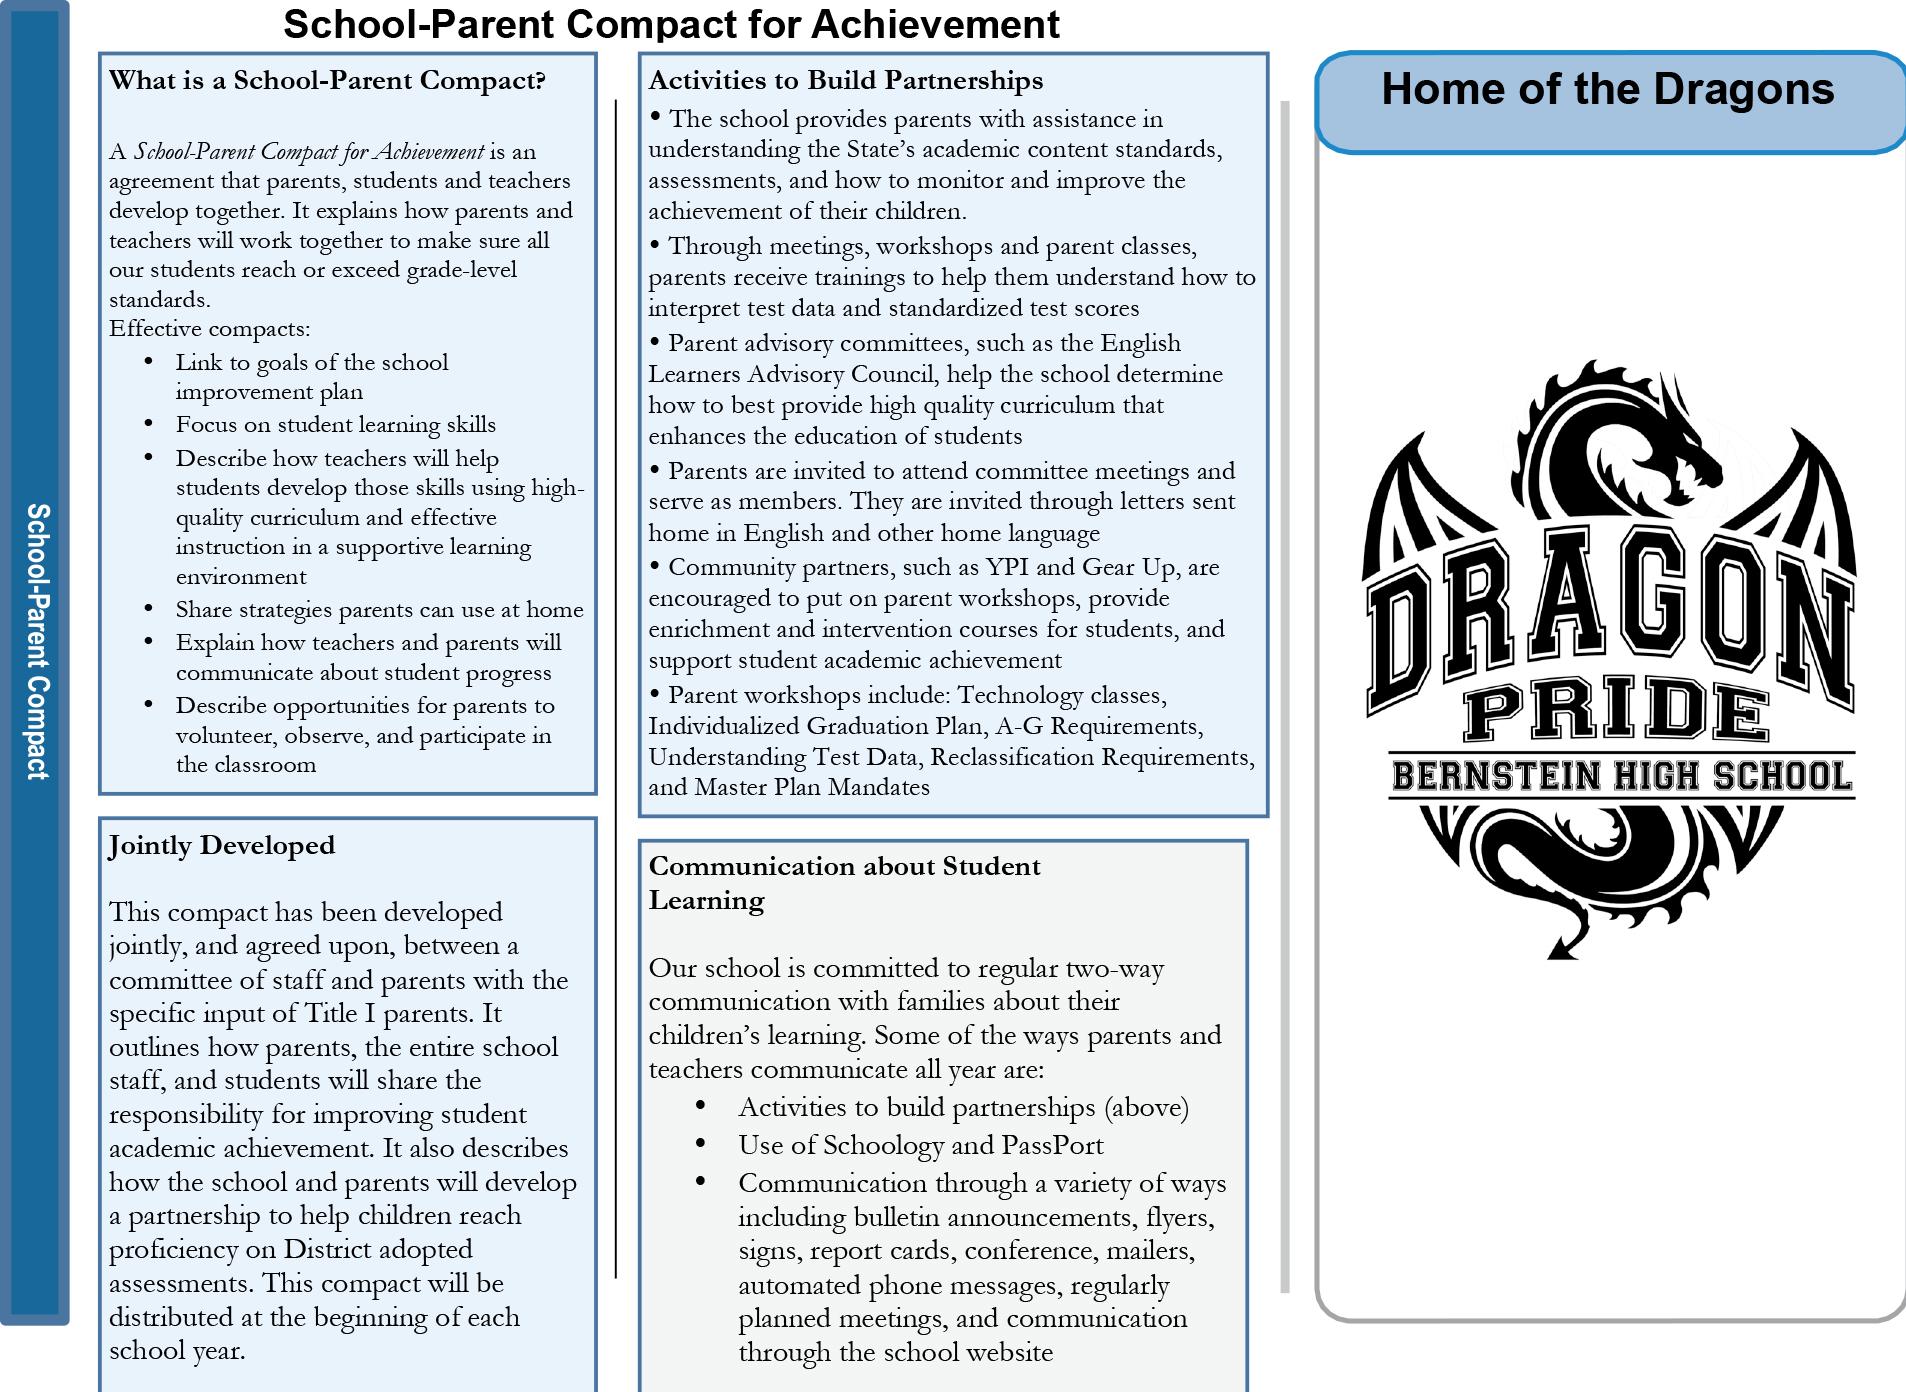 SchoolParent Compact HBHS 2018-2019